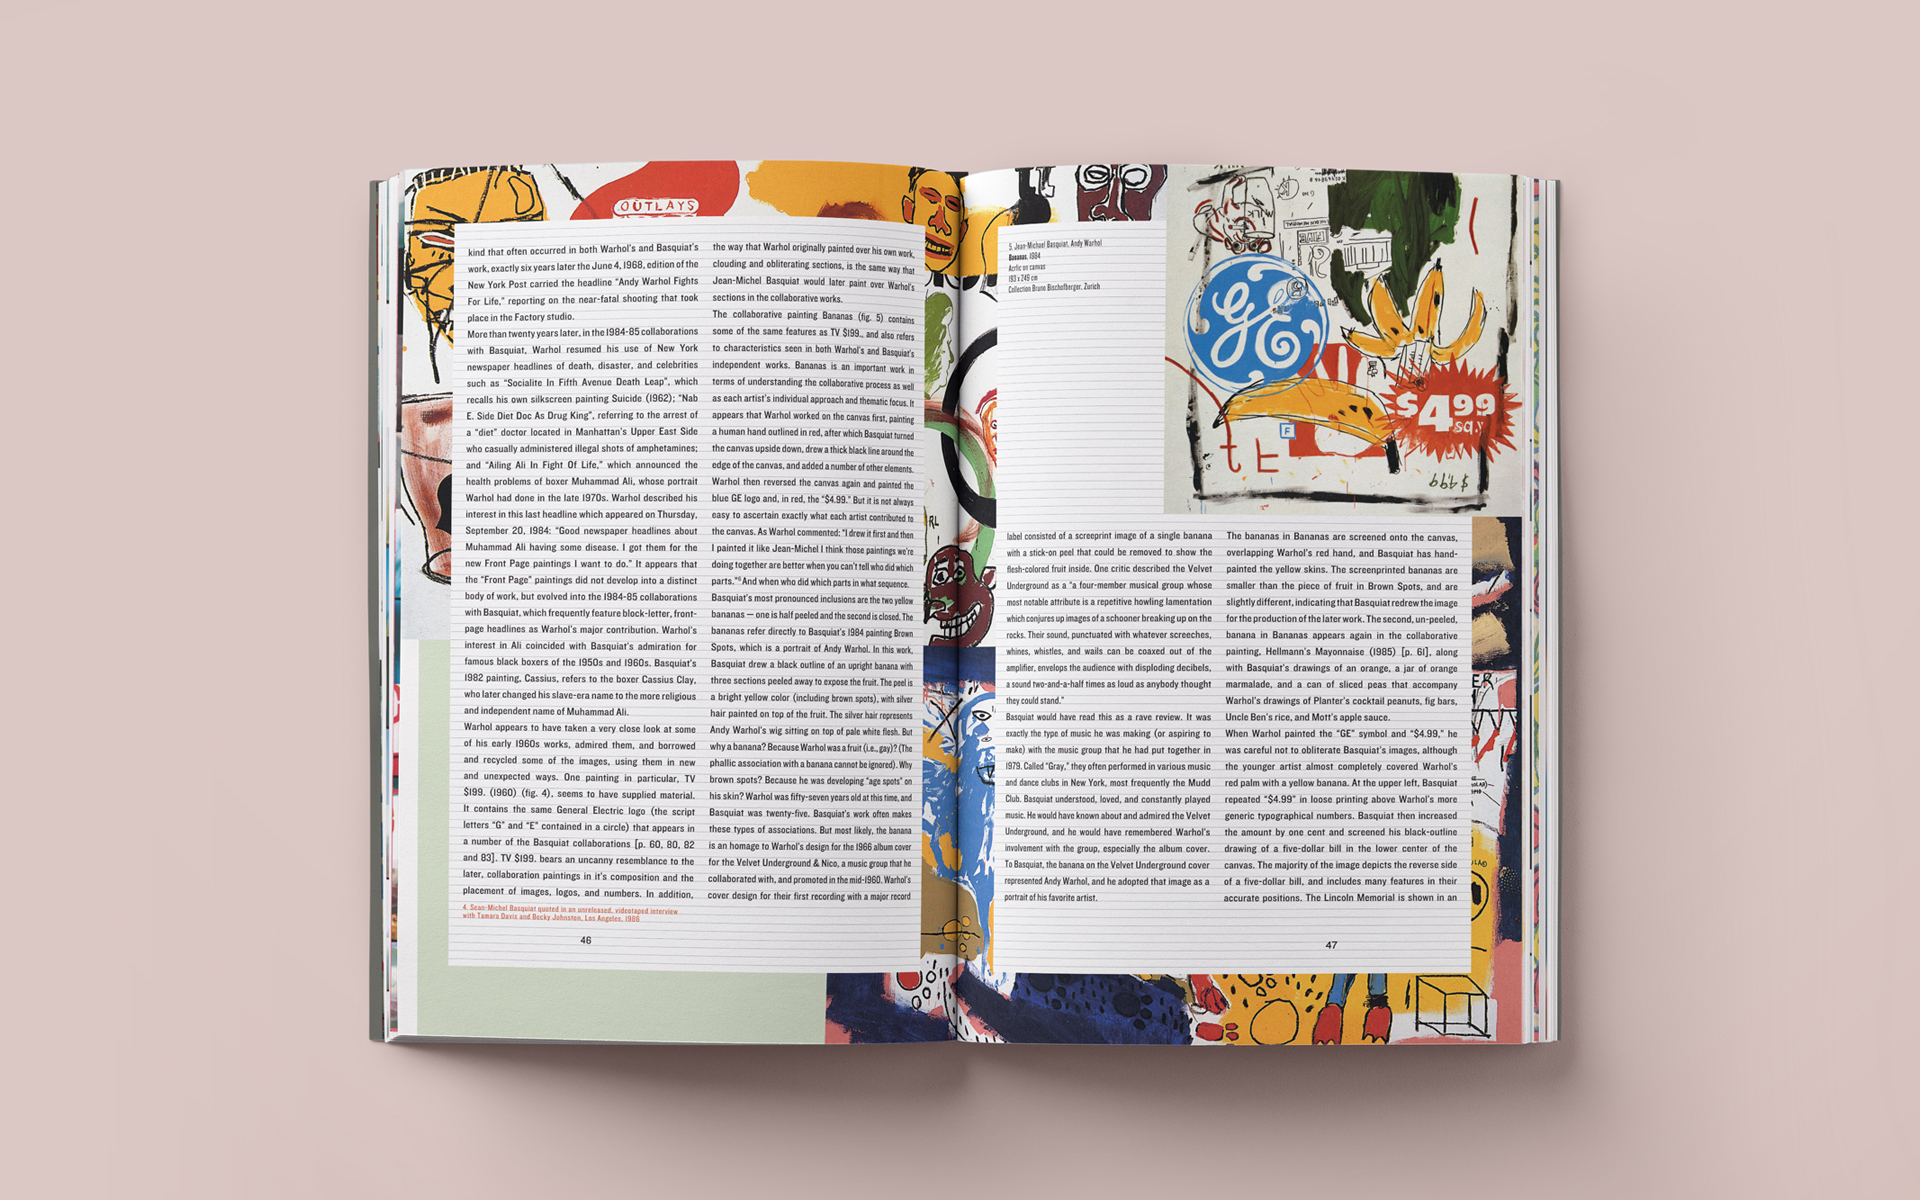 Warhol_Basquiat_Book_Sprerad_02